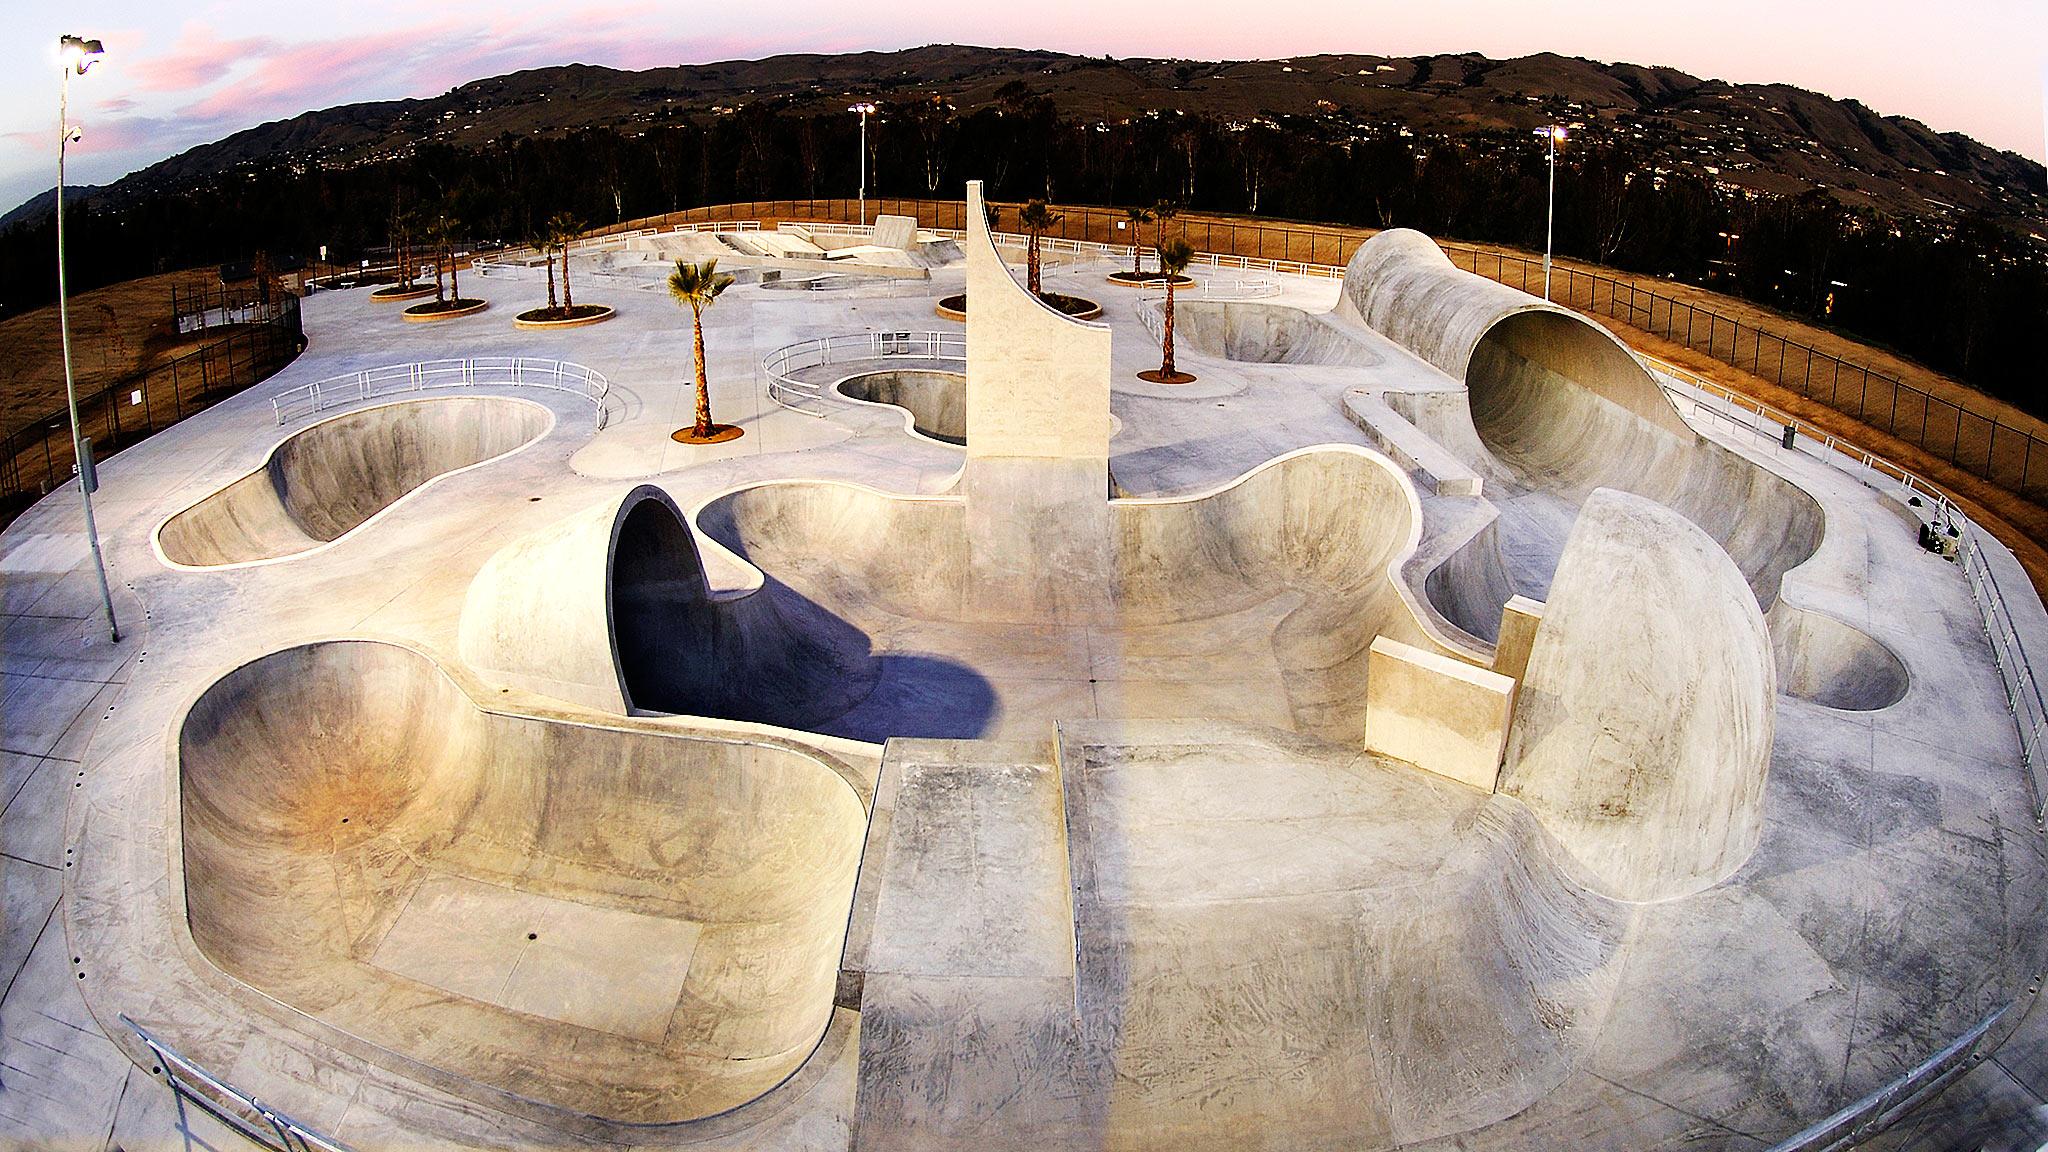 lake cunningham regional skatepark, san jose, california